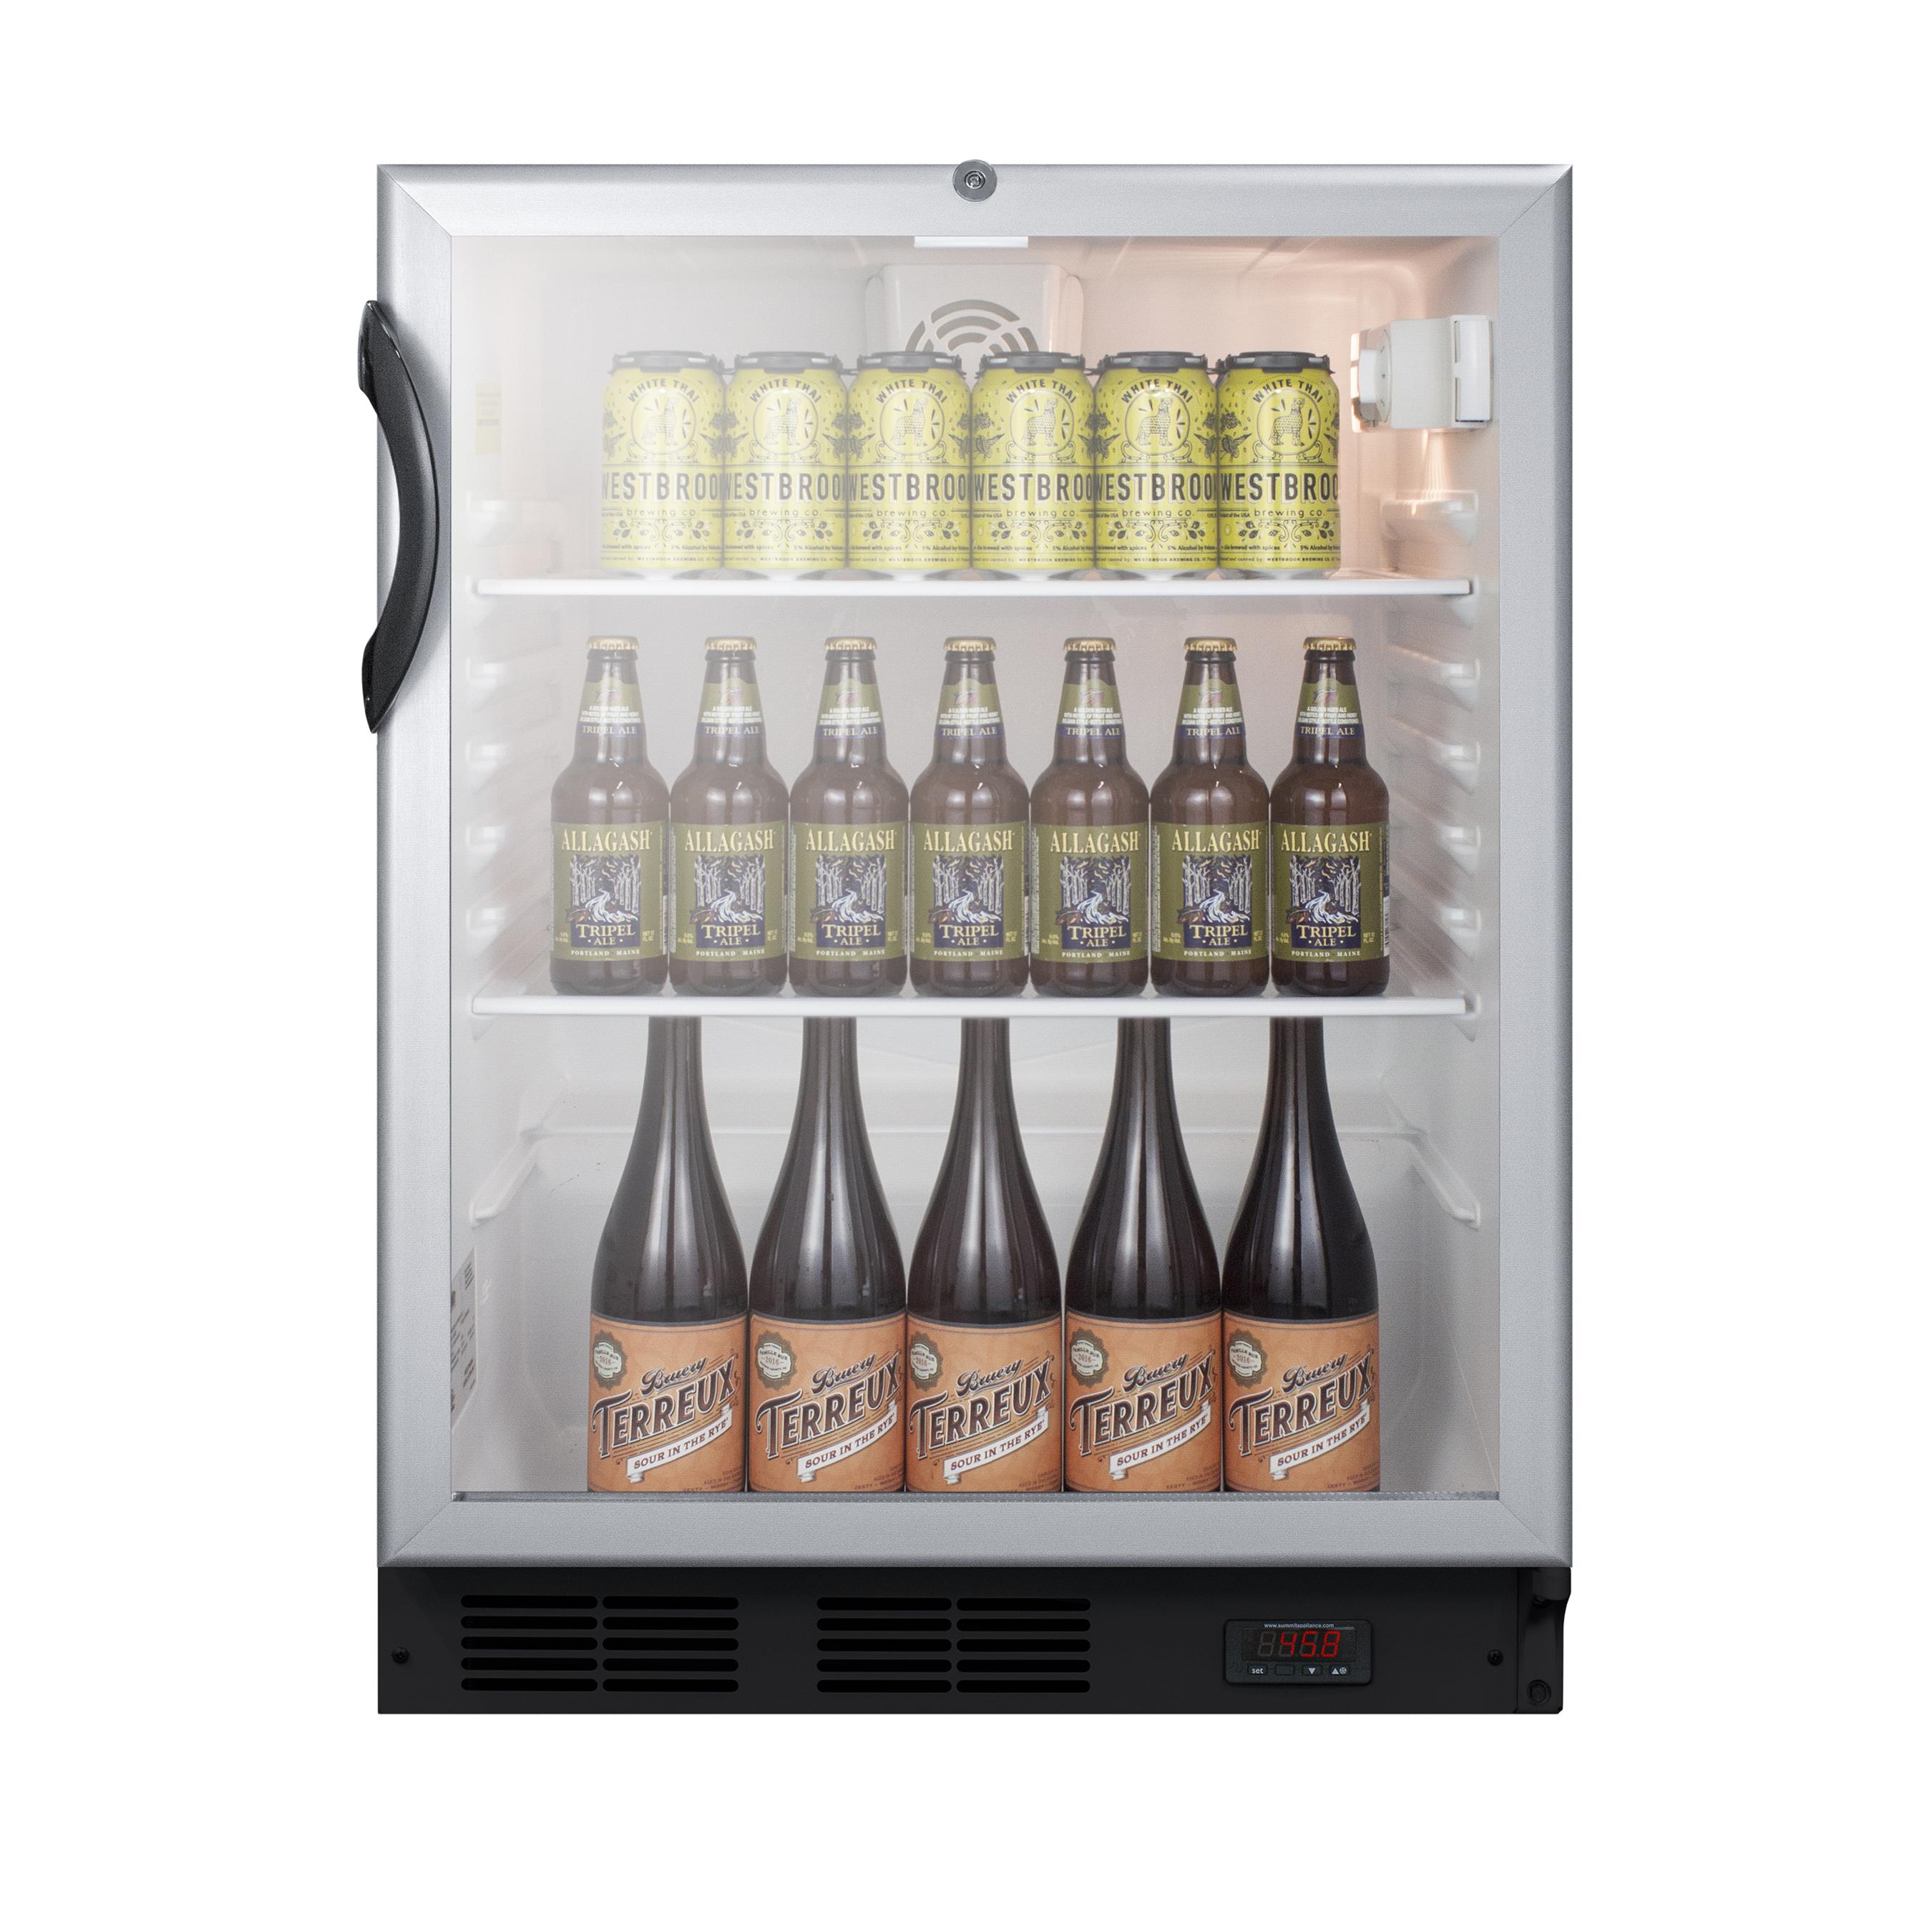 Summit Appliance SCR600BGLDTPUBADA refrigerator, merchandiser, countertop